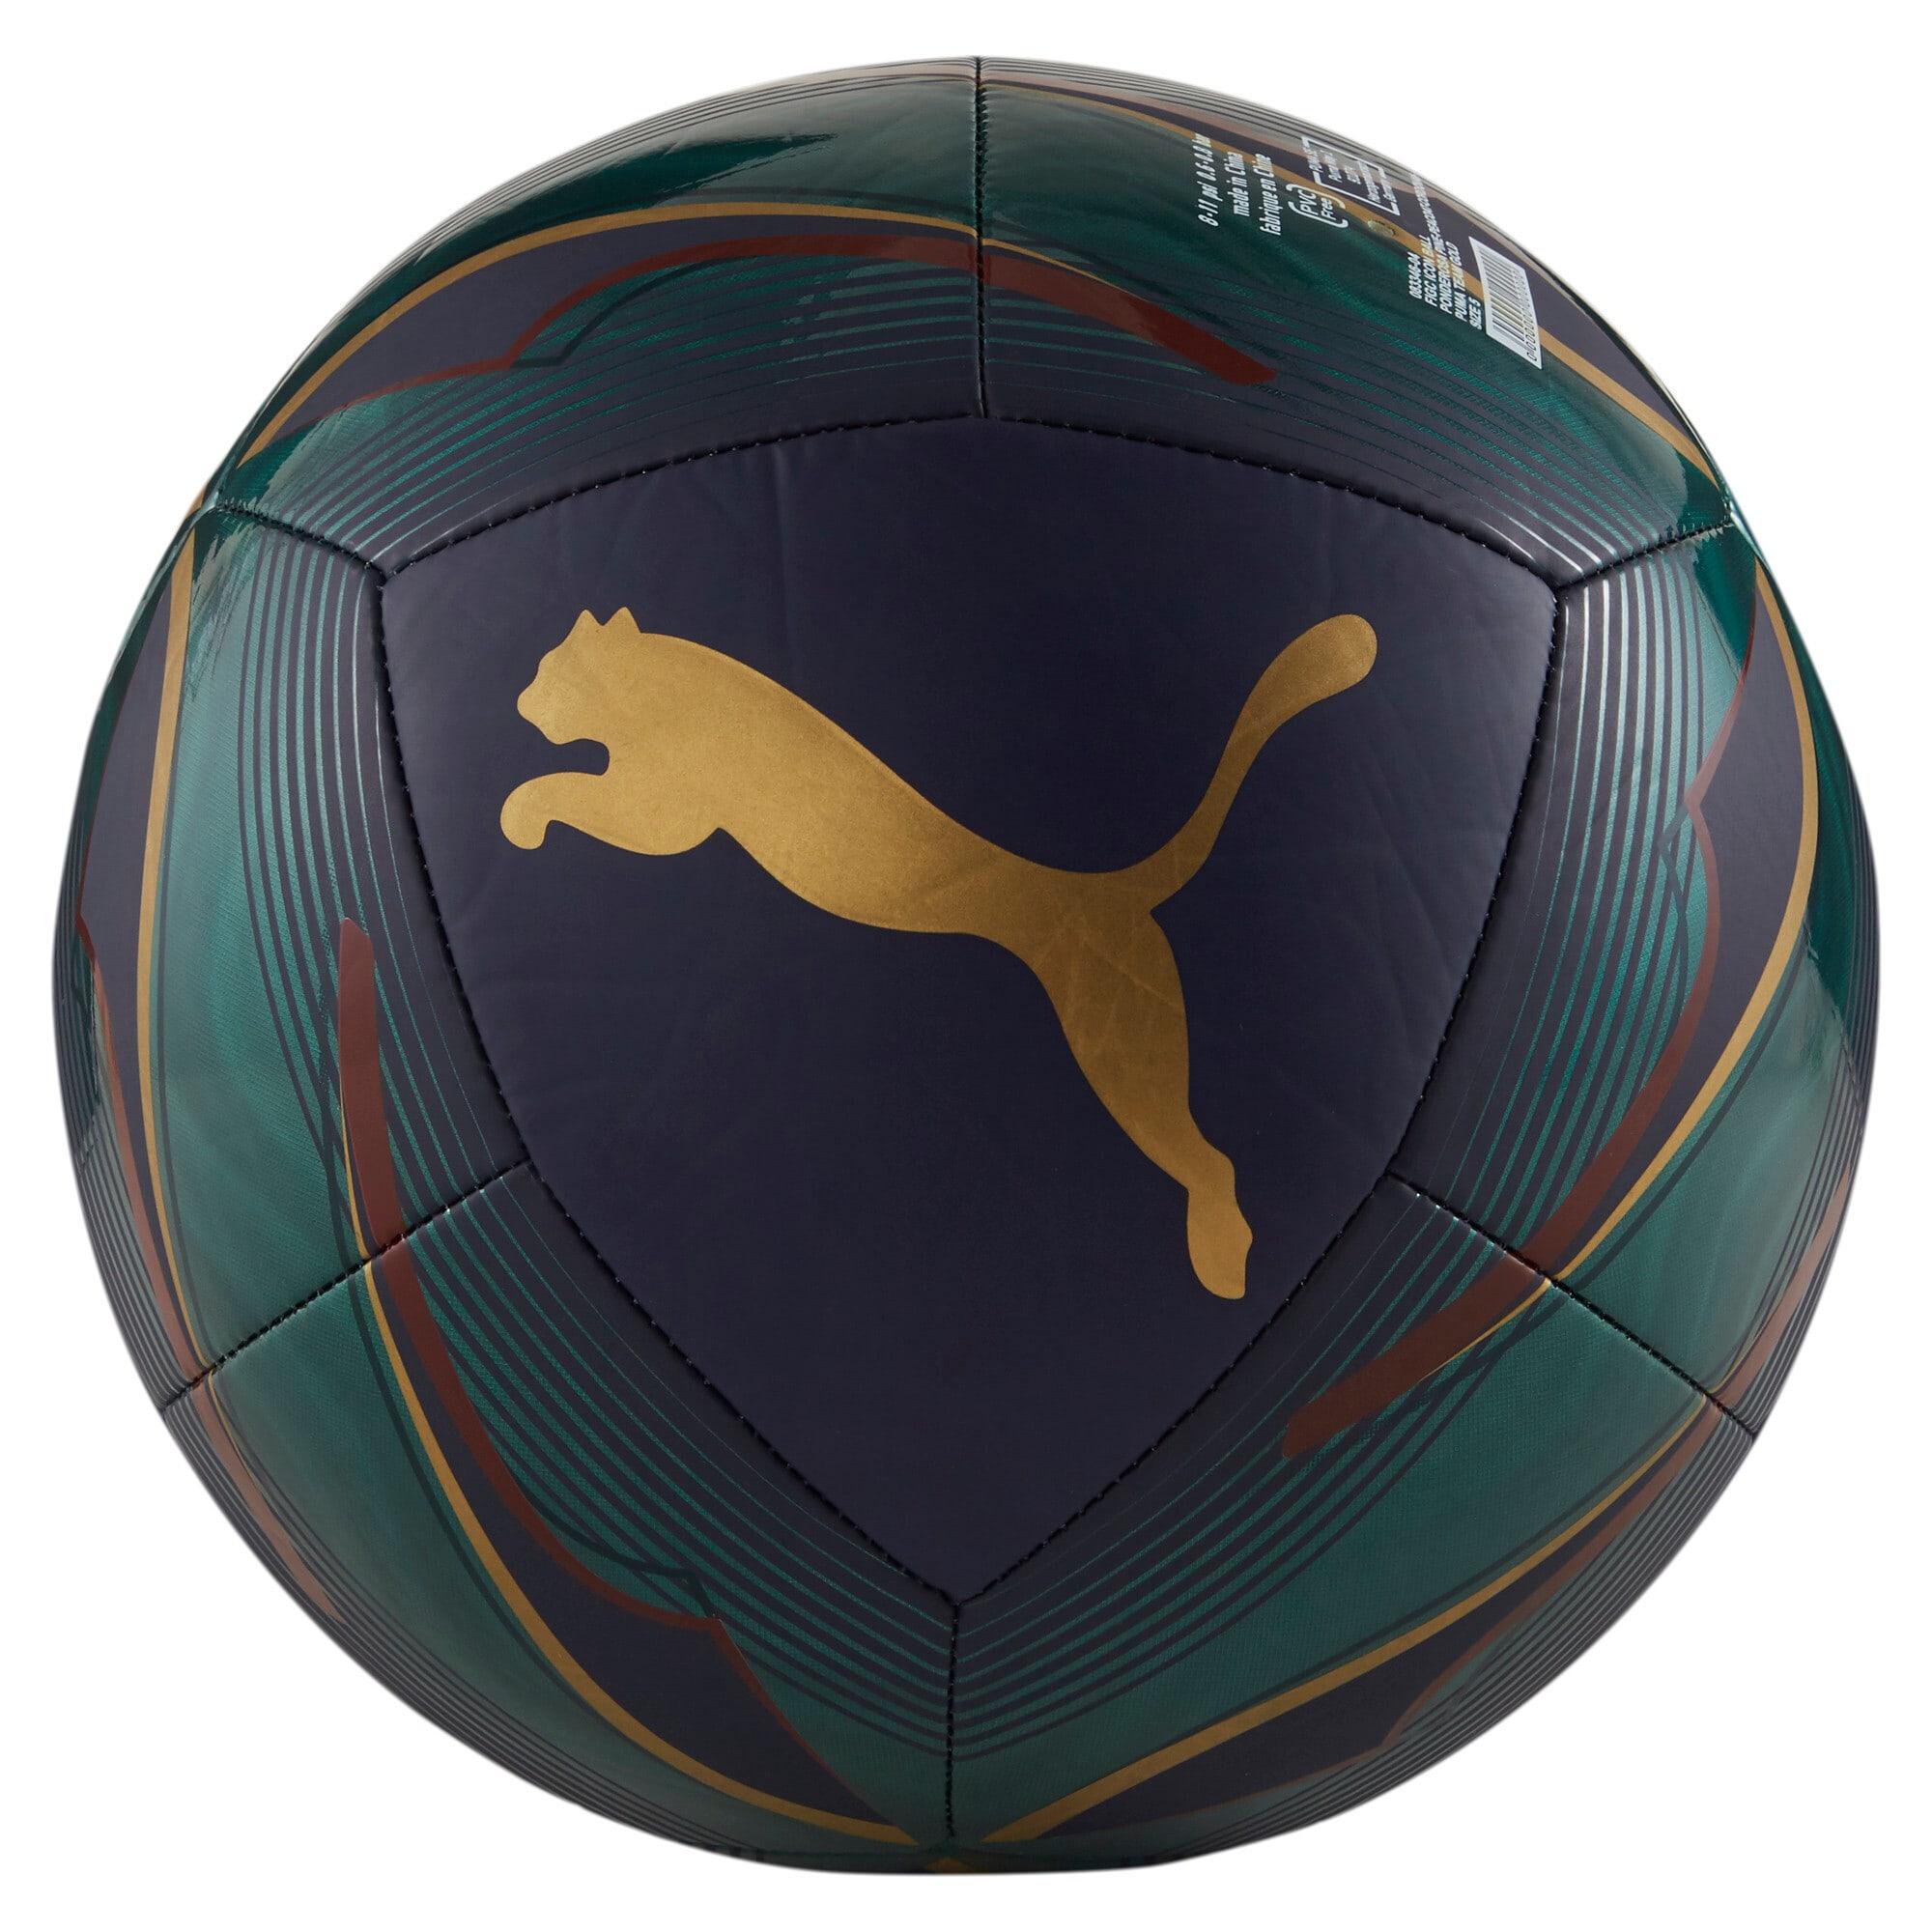 Thumbnail 1 of Italia Icon Football, Ponderosa Pine-Peacoat, medium